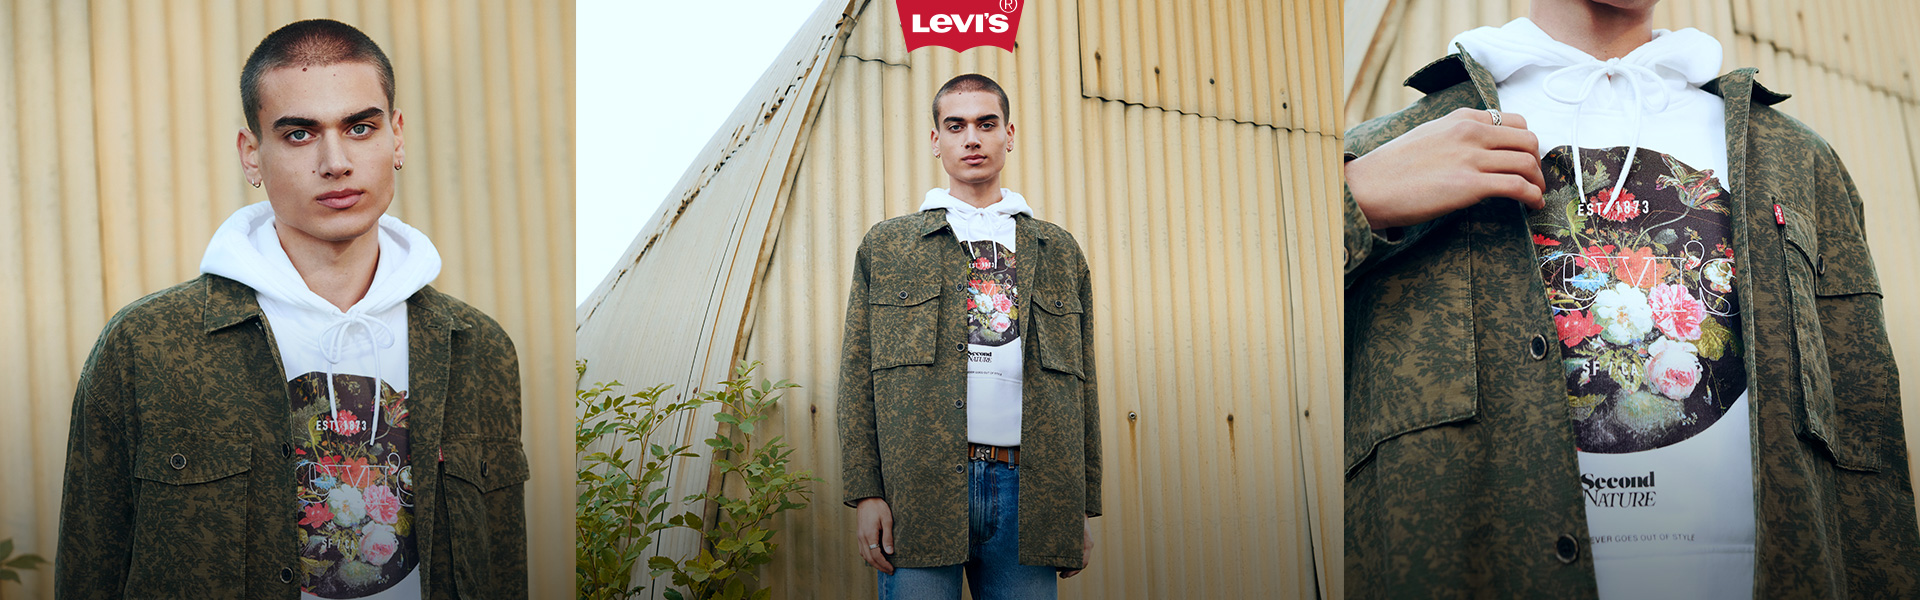 >Levi's® Modern Vintage